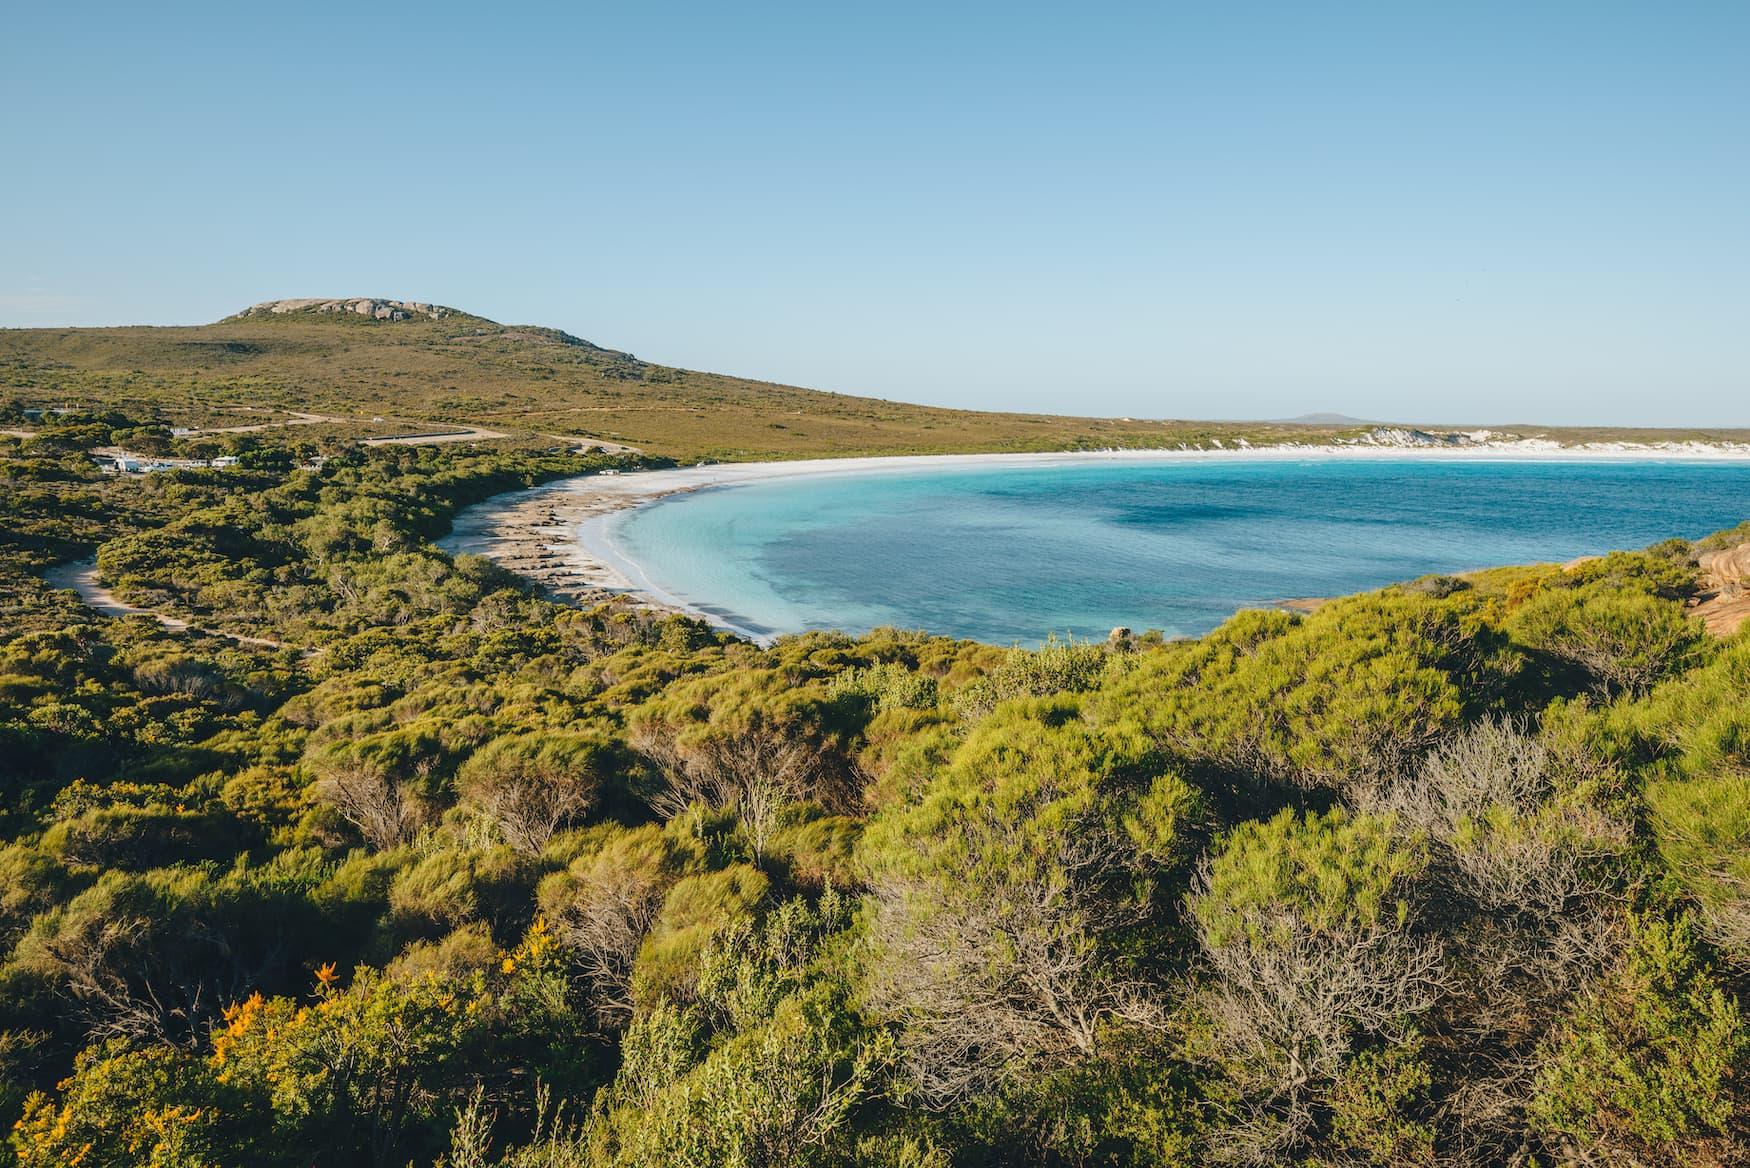 Nationalparks Westaustralien: Lucky bay